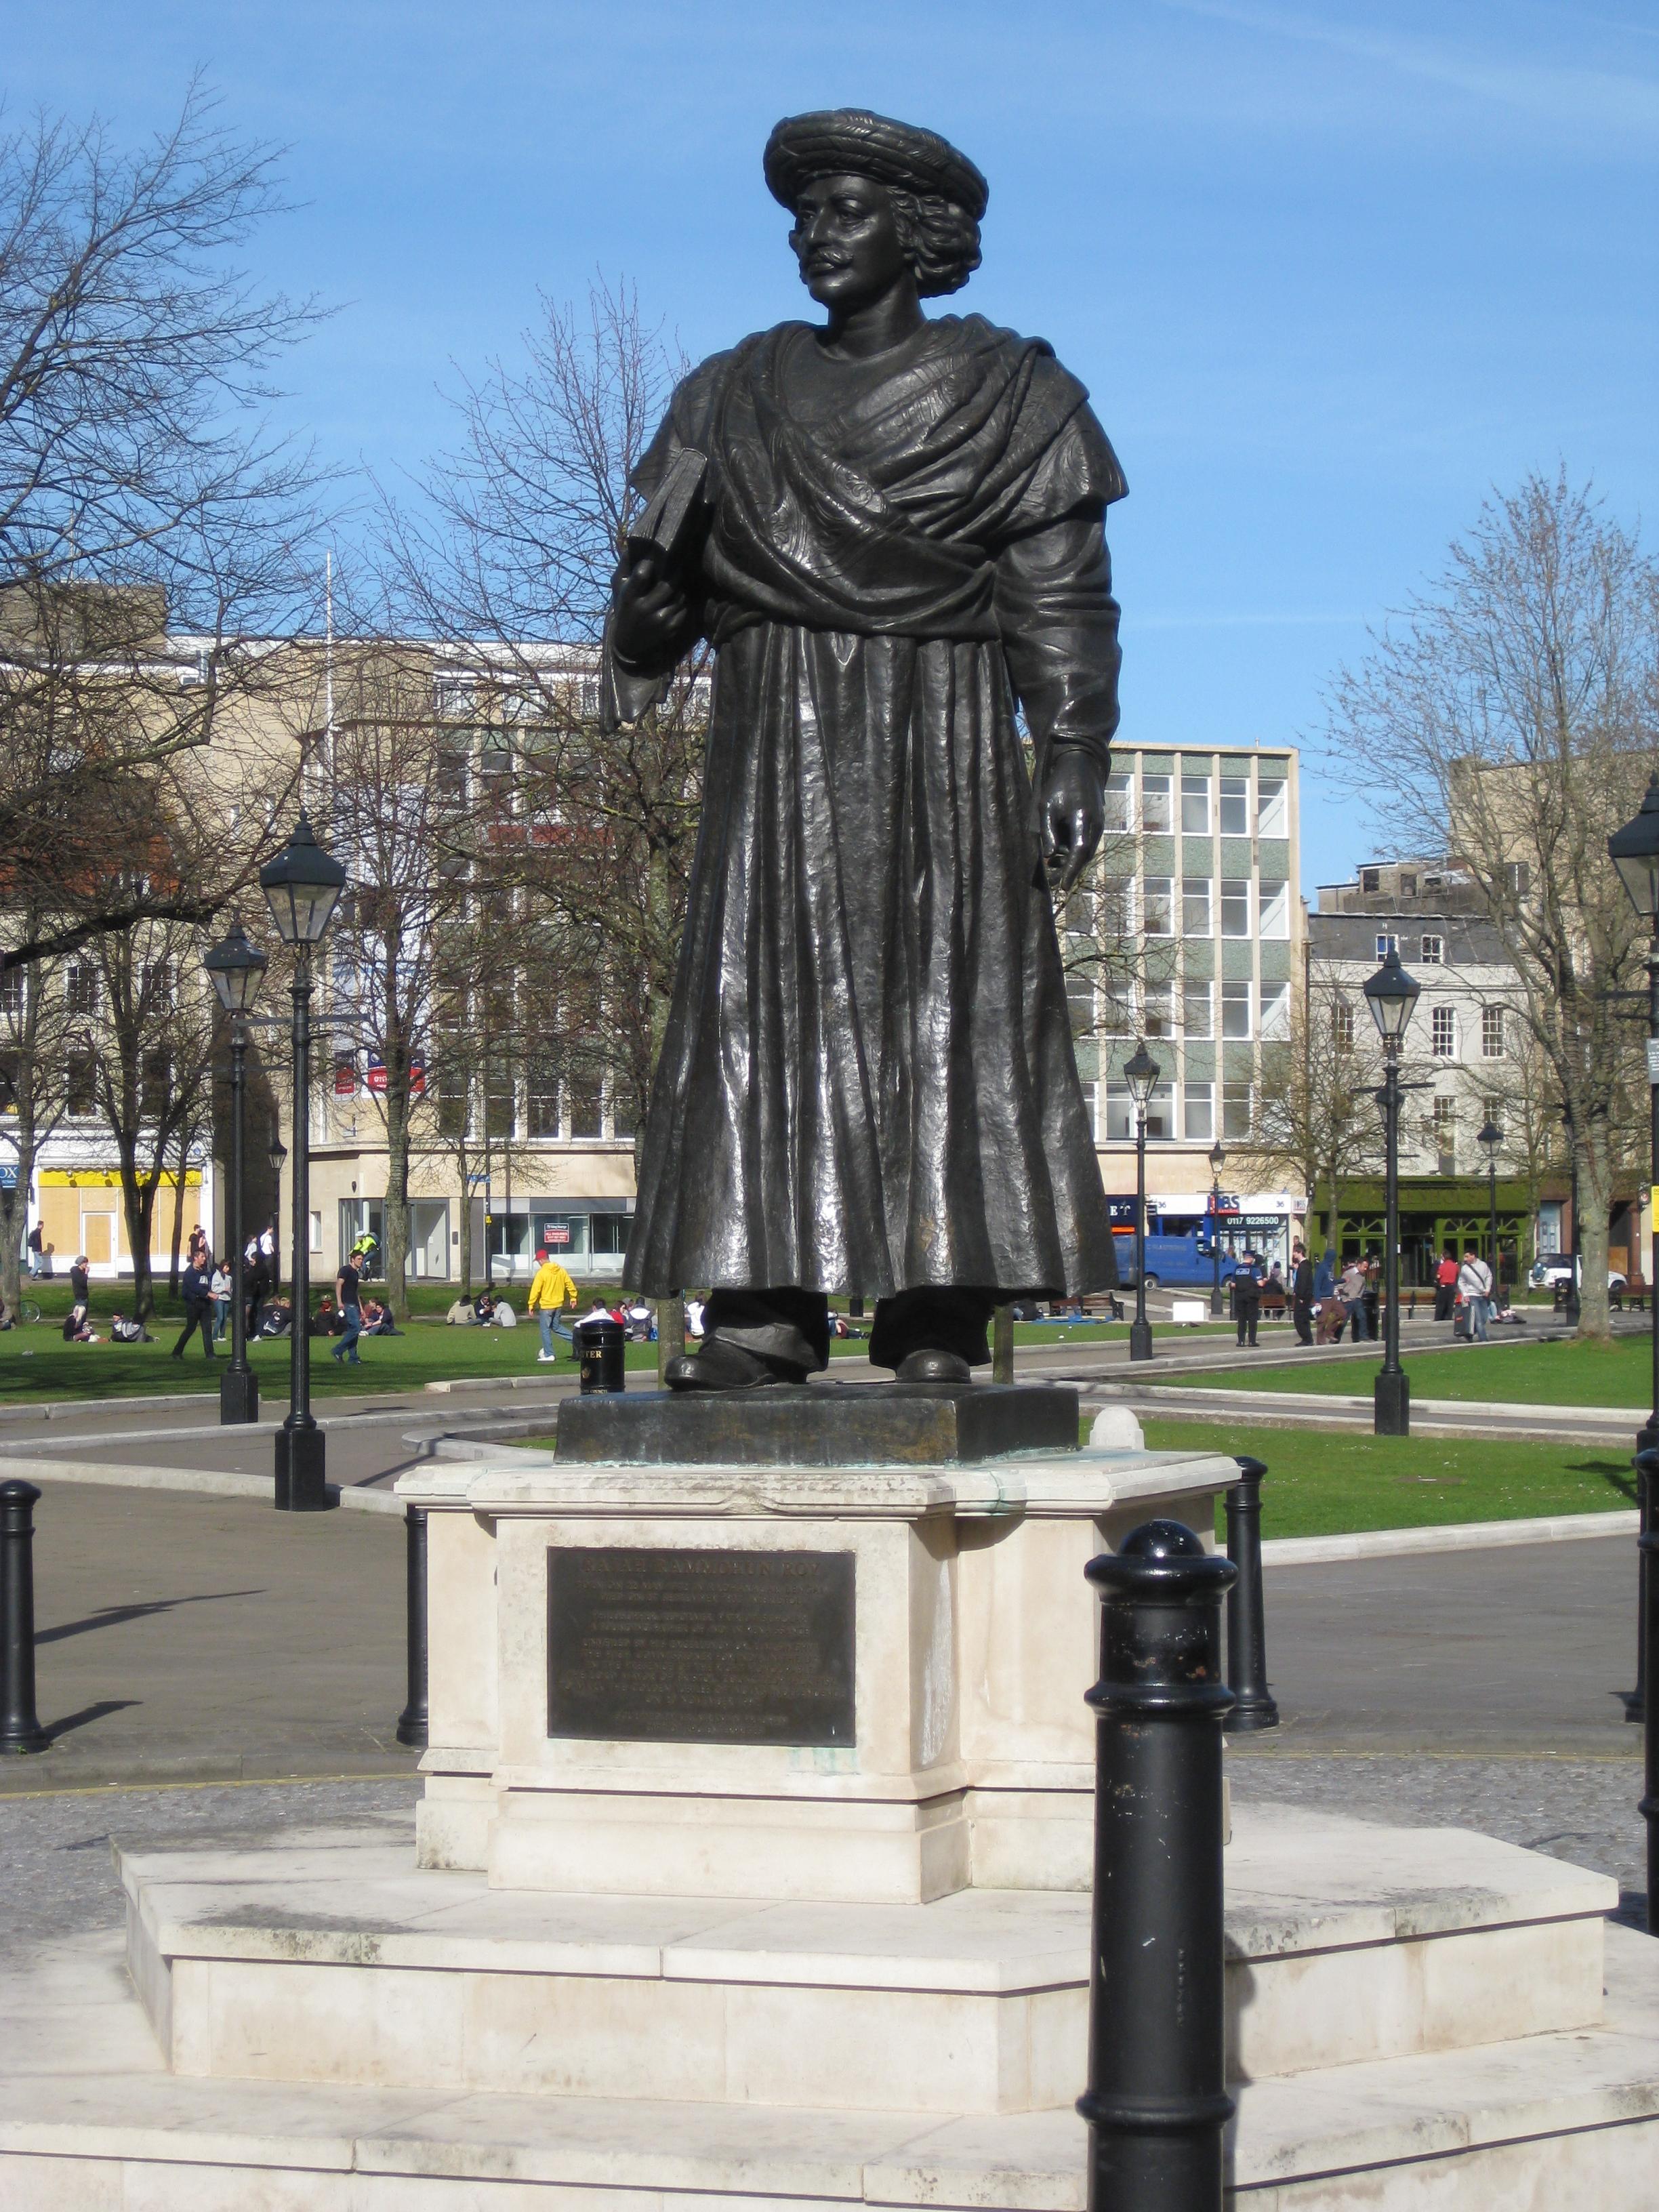 Statue in College Green, Bristol, England